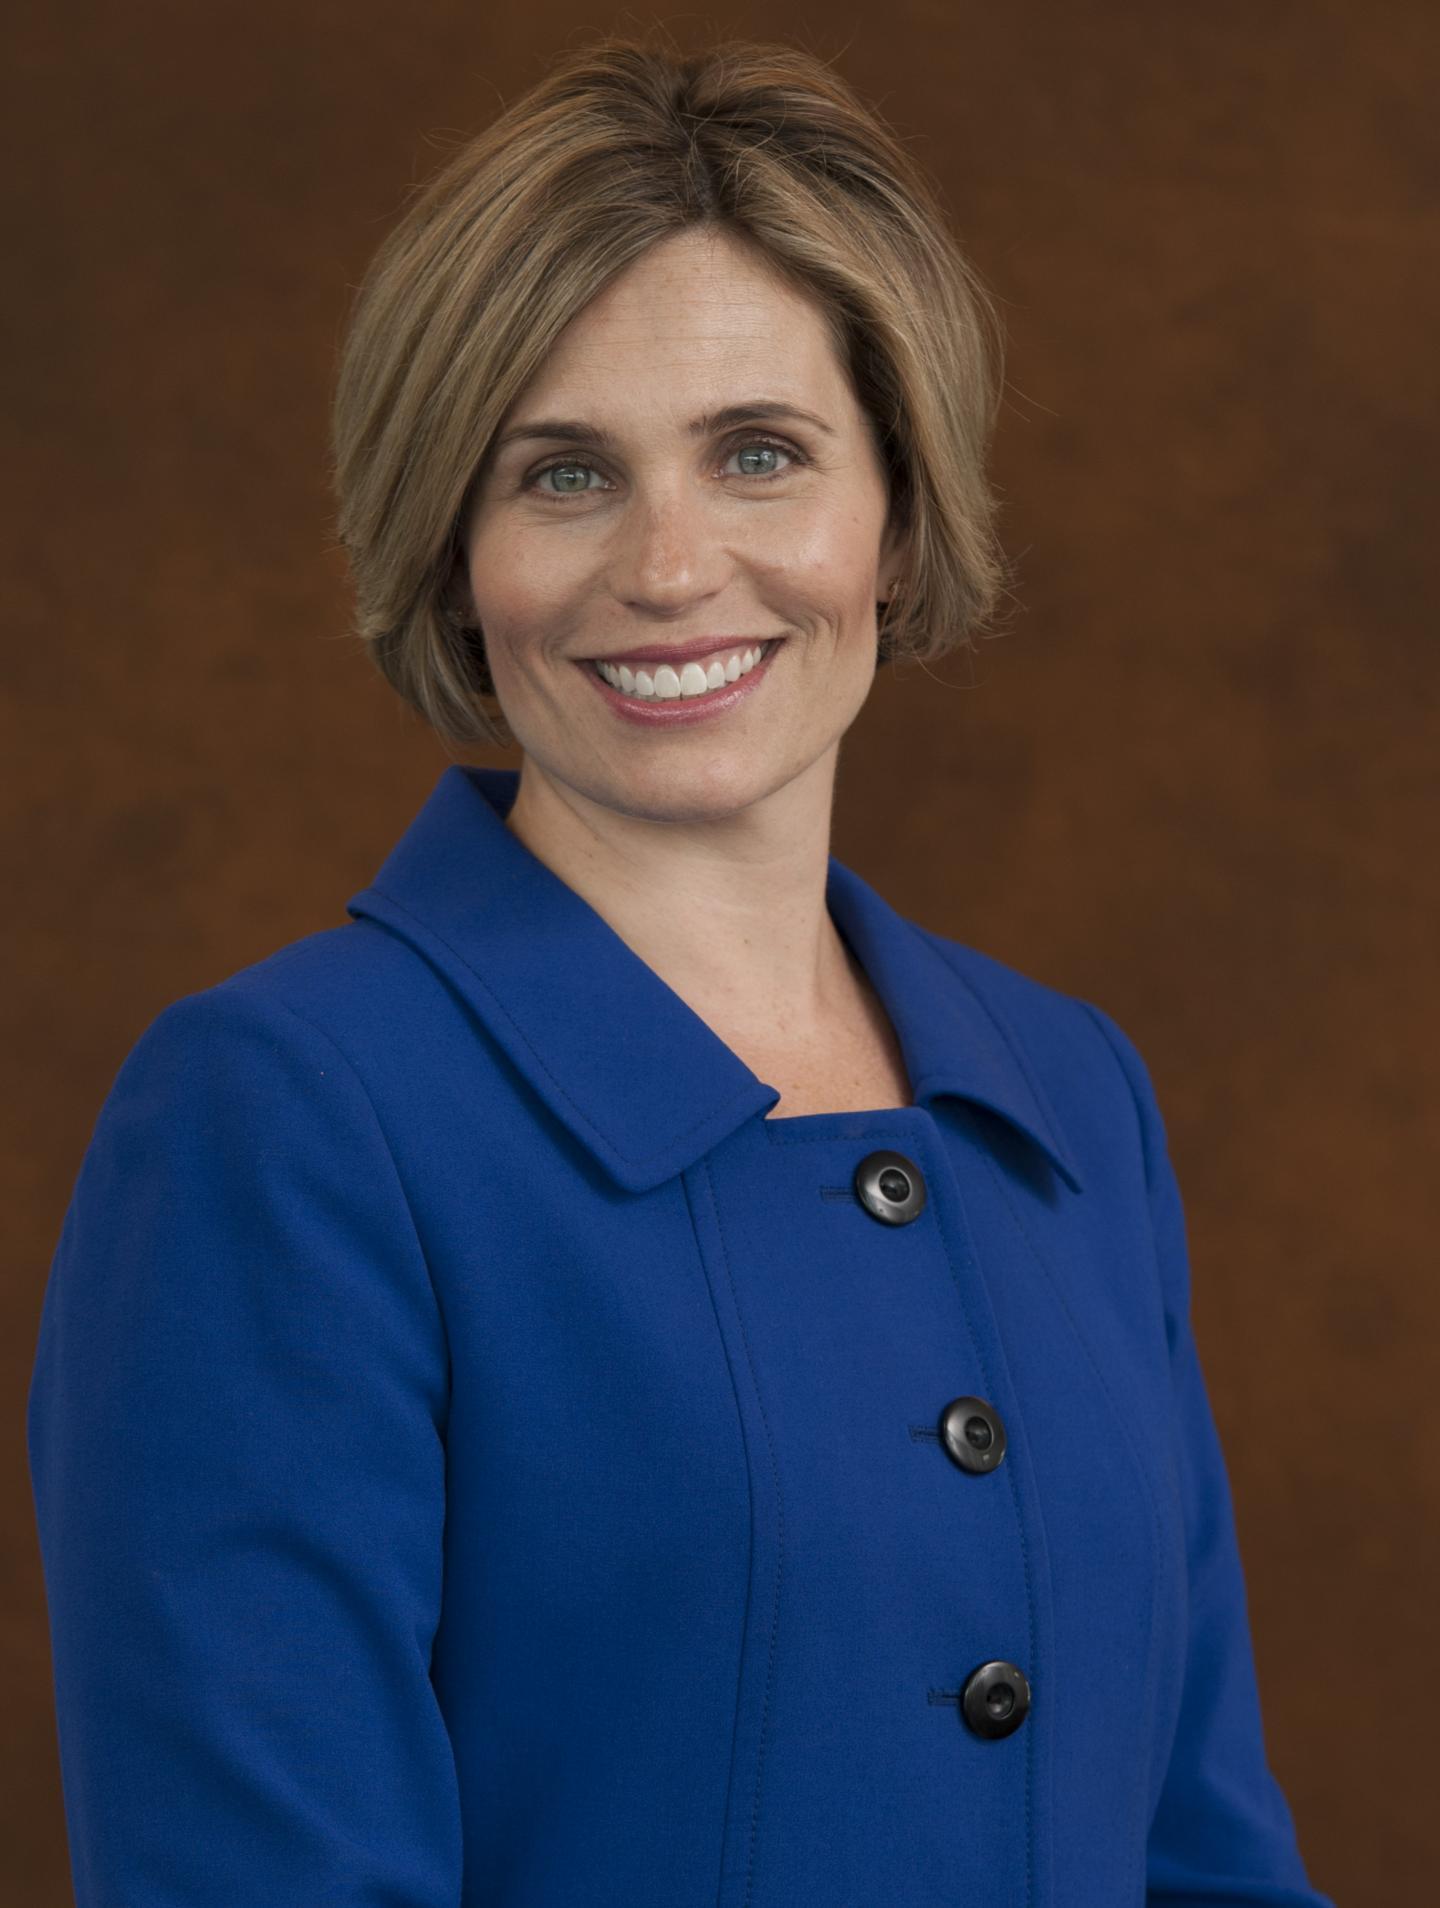 Nicole Fowler, Indiana University